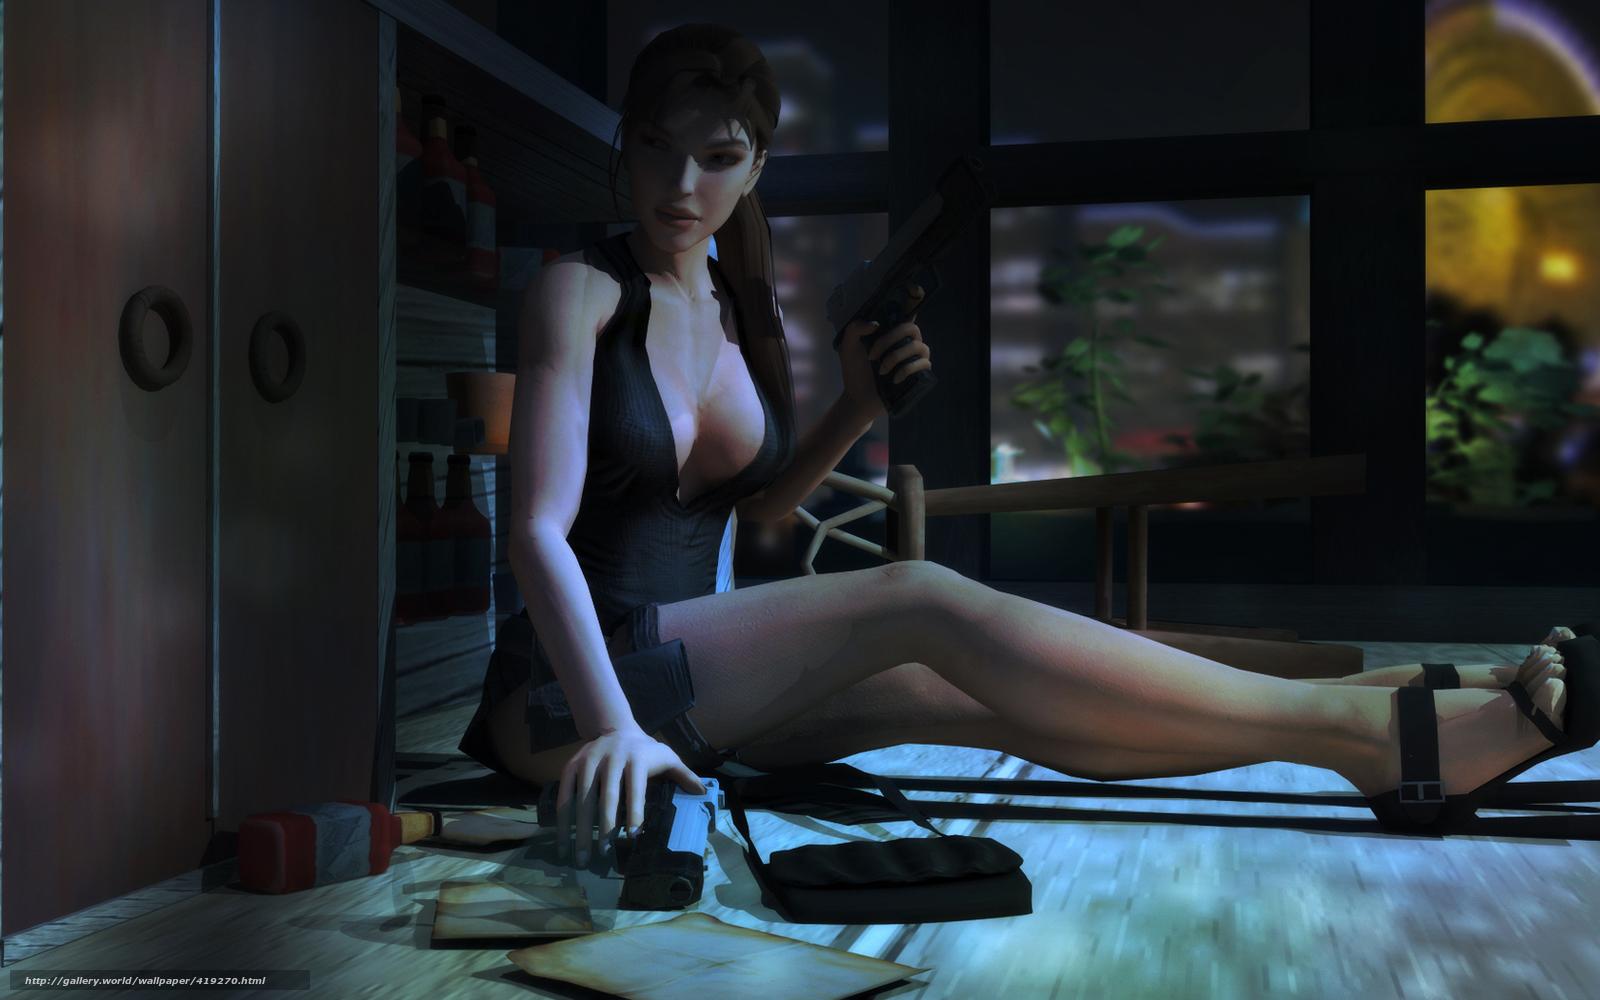 Lara croft 3 d monster bilder free porn pic